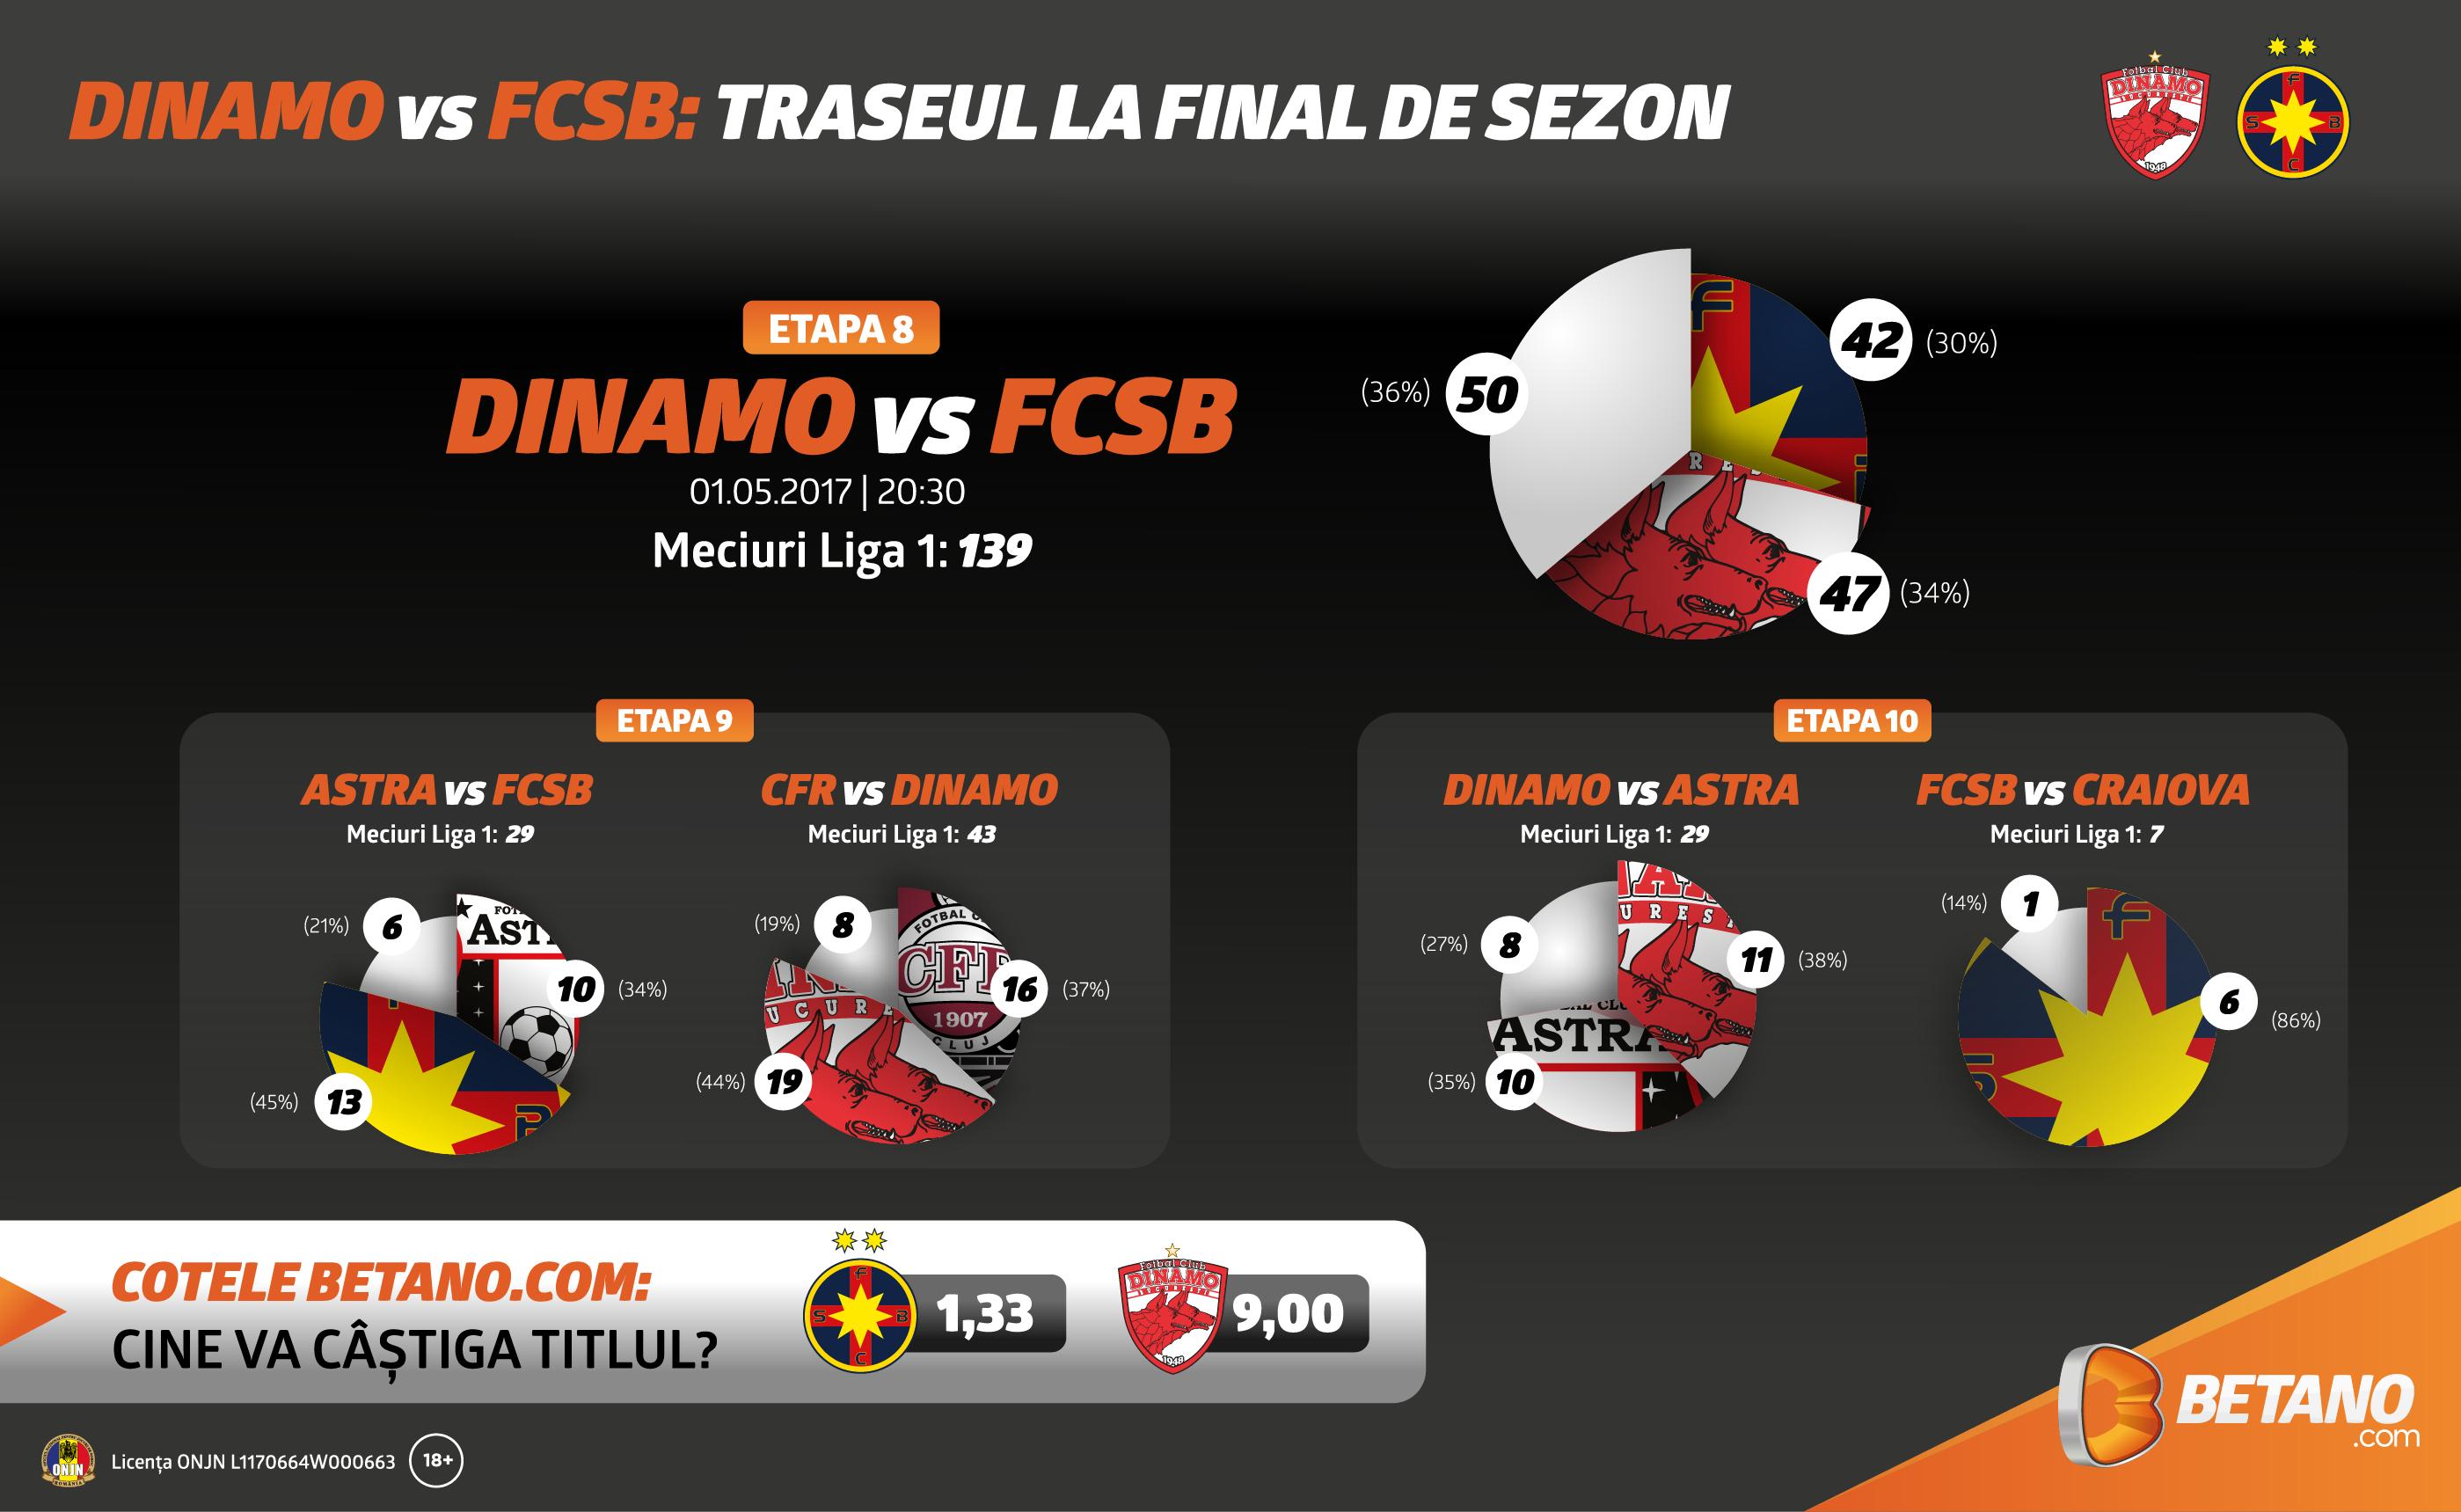 Dinamo vs Steaua, un meci cu miza pentru titlu (calcule si info-grafic)